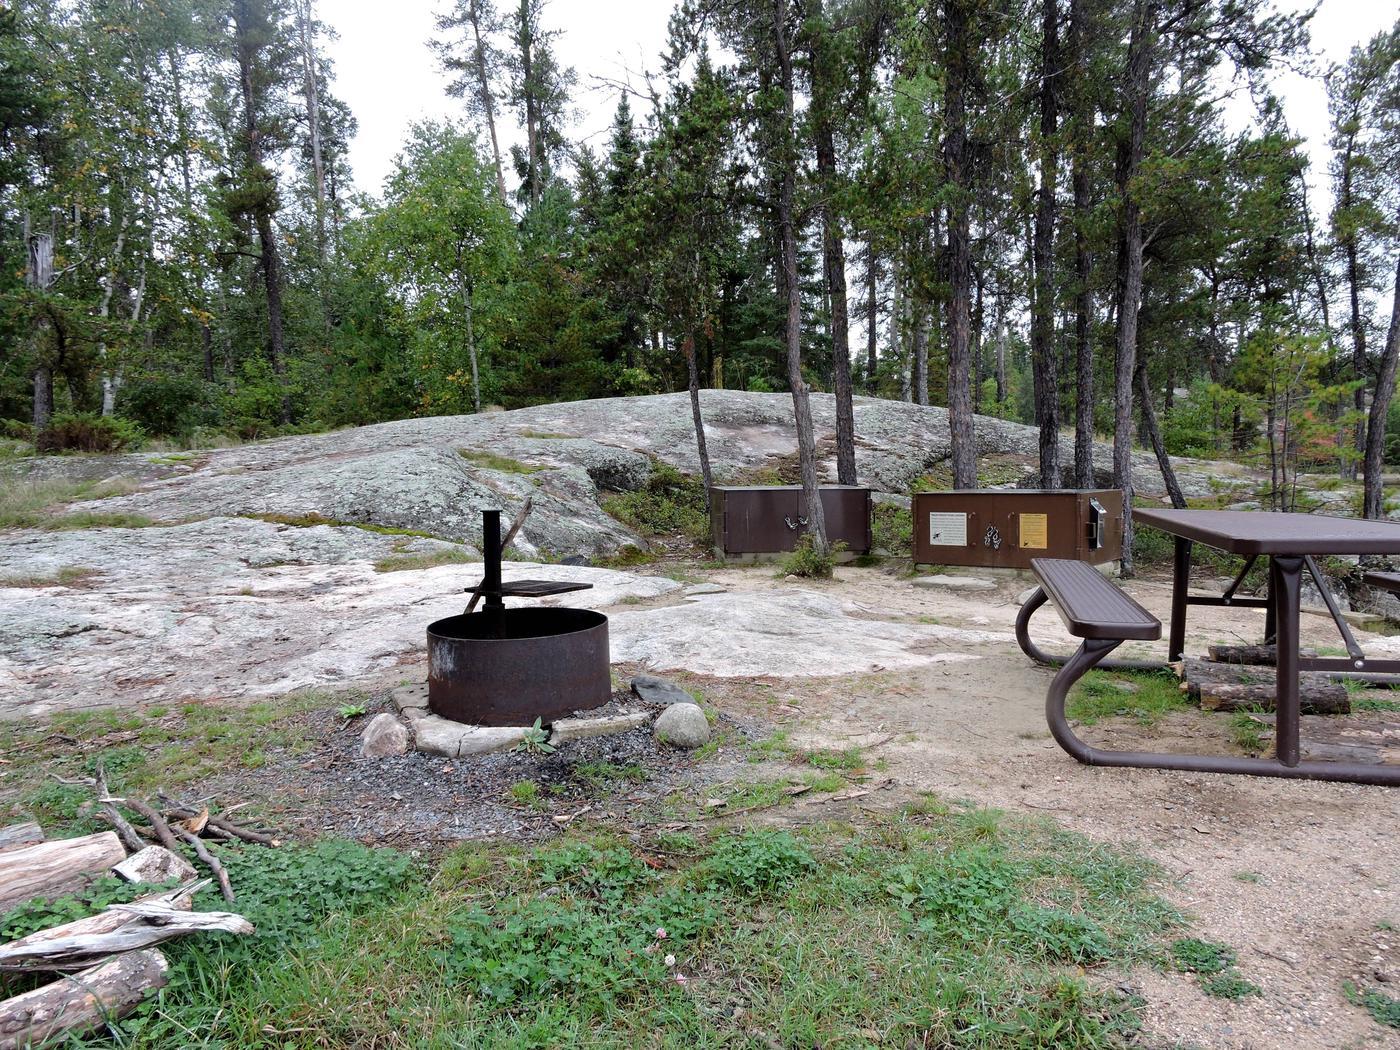 R90 - Anderson Bay WestView of campsite